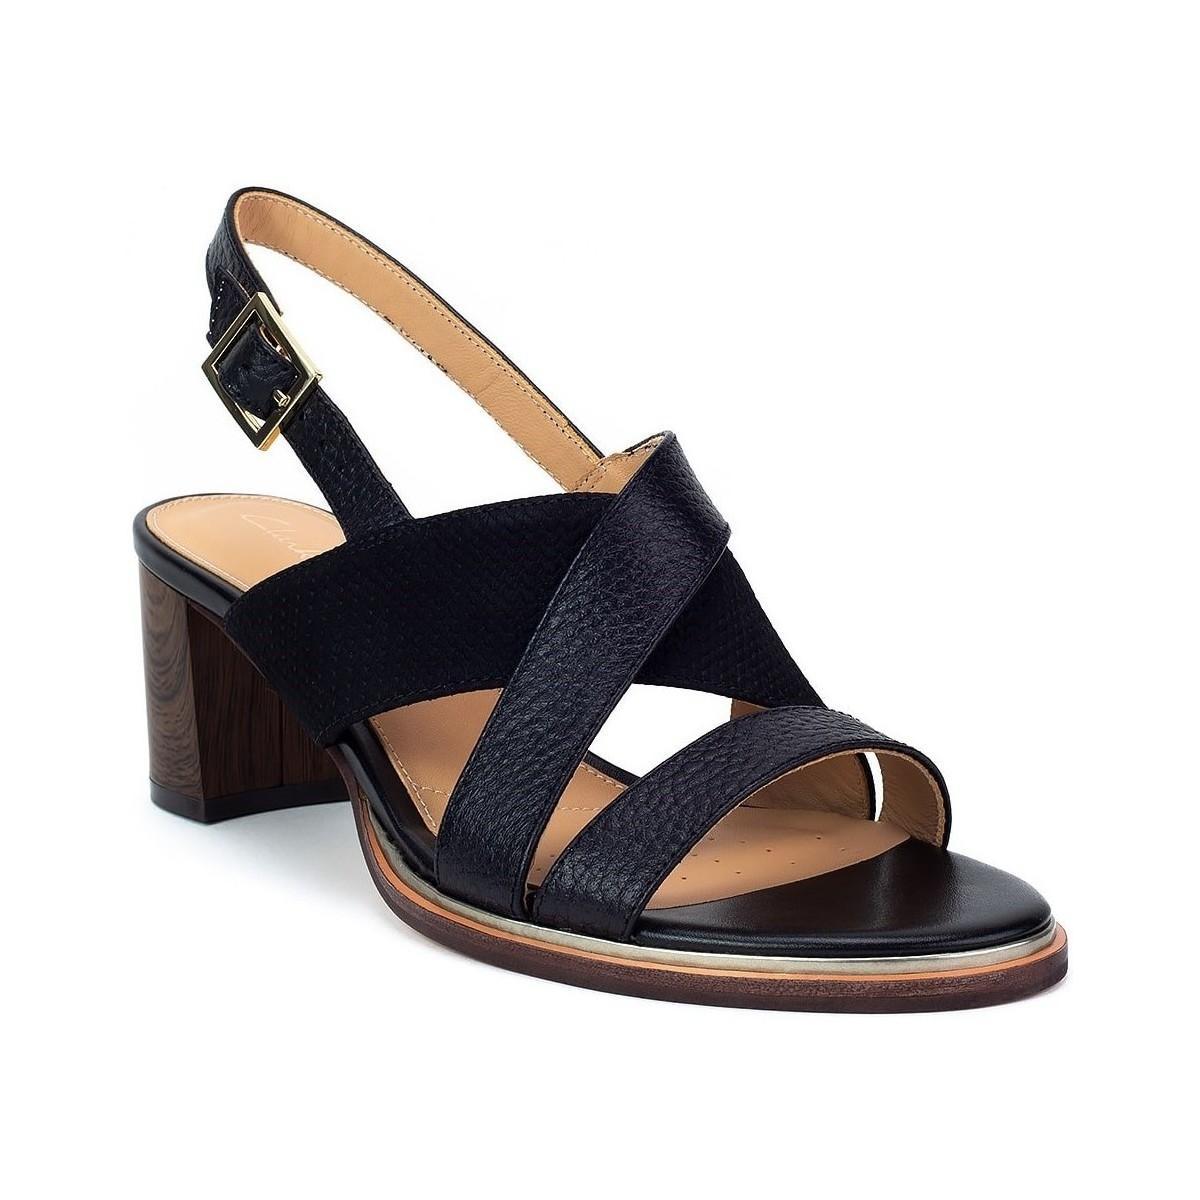 32496a12170f Clarks Ellis Tilda Women s Sandals In Black in Black - Lyst